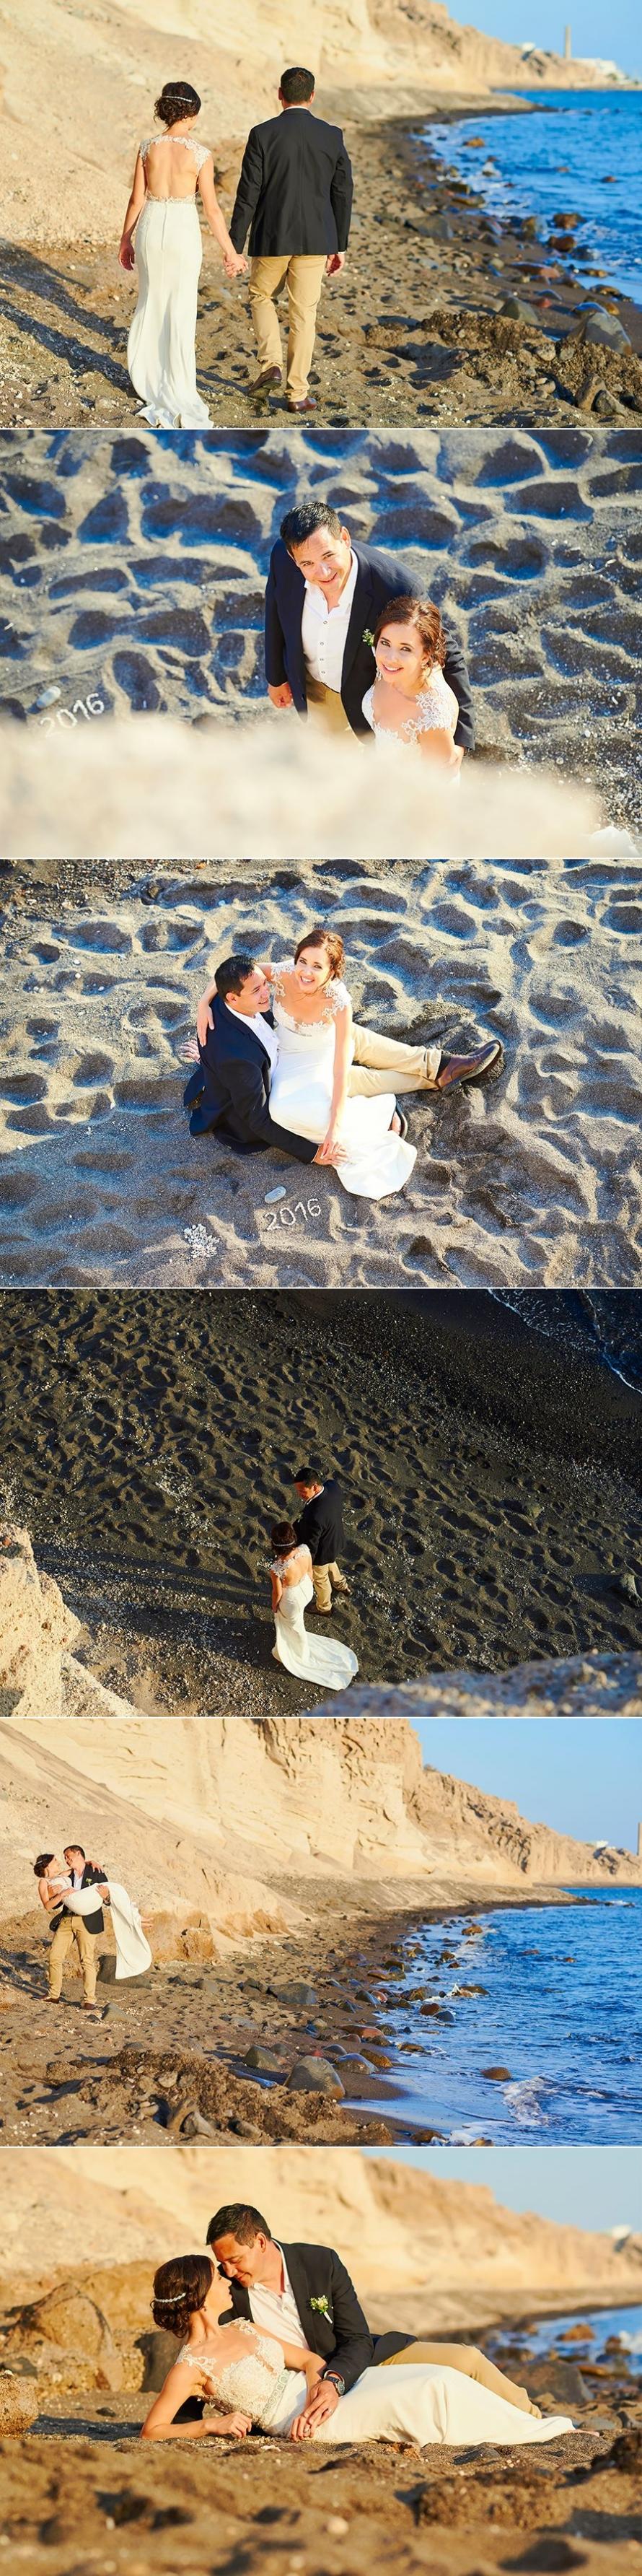 paul-simone-wedding-photos-12